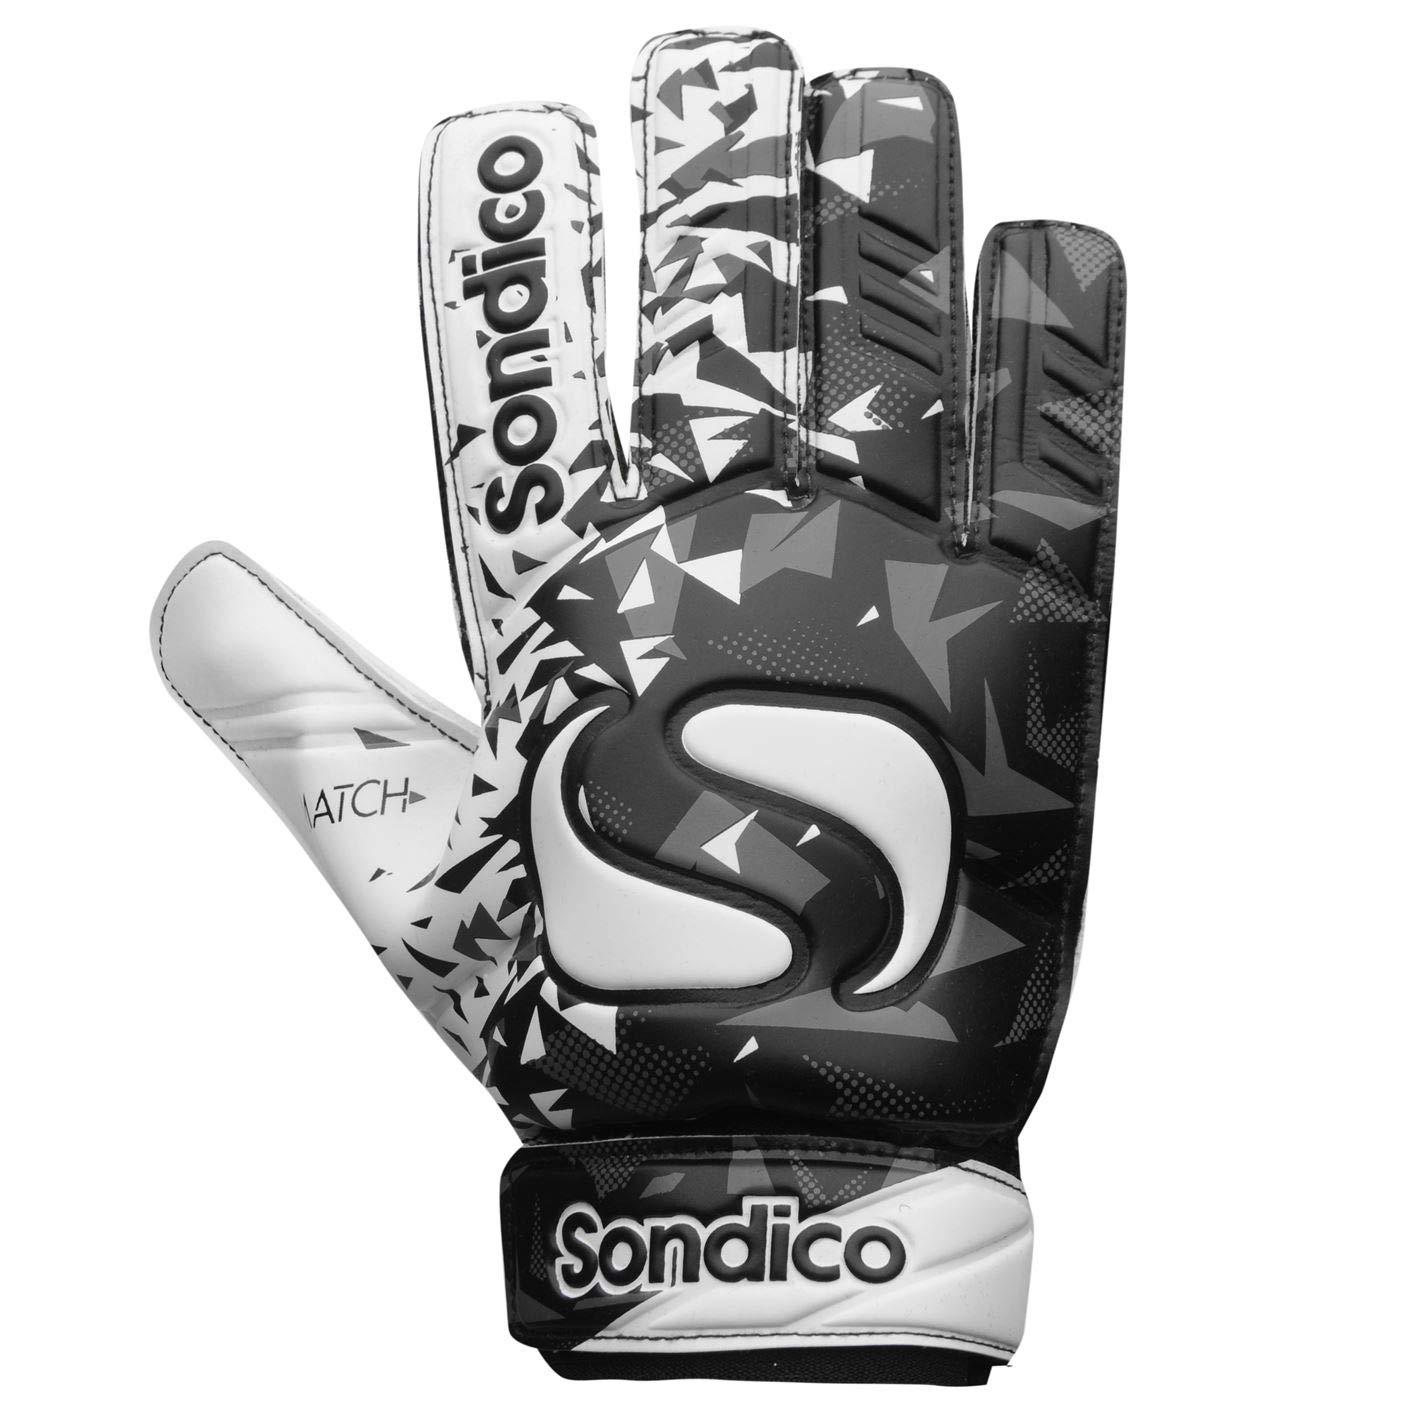 Sondico Herren Match Fußball Torwart Handschuhe Klettverschluss